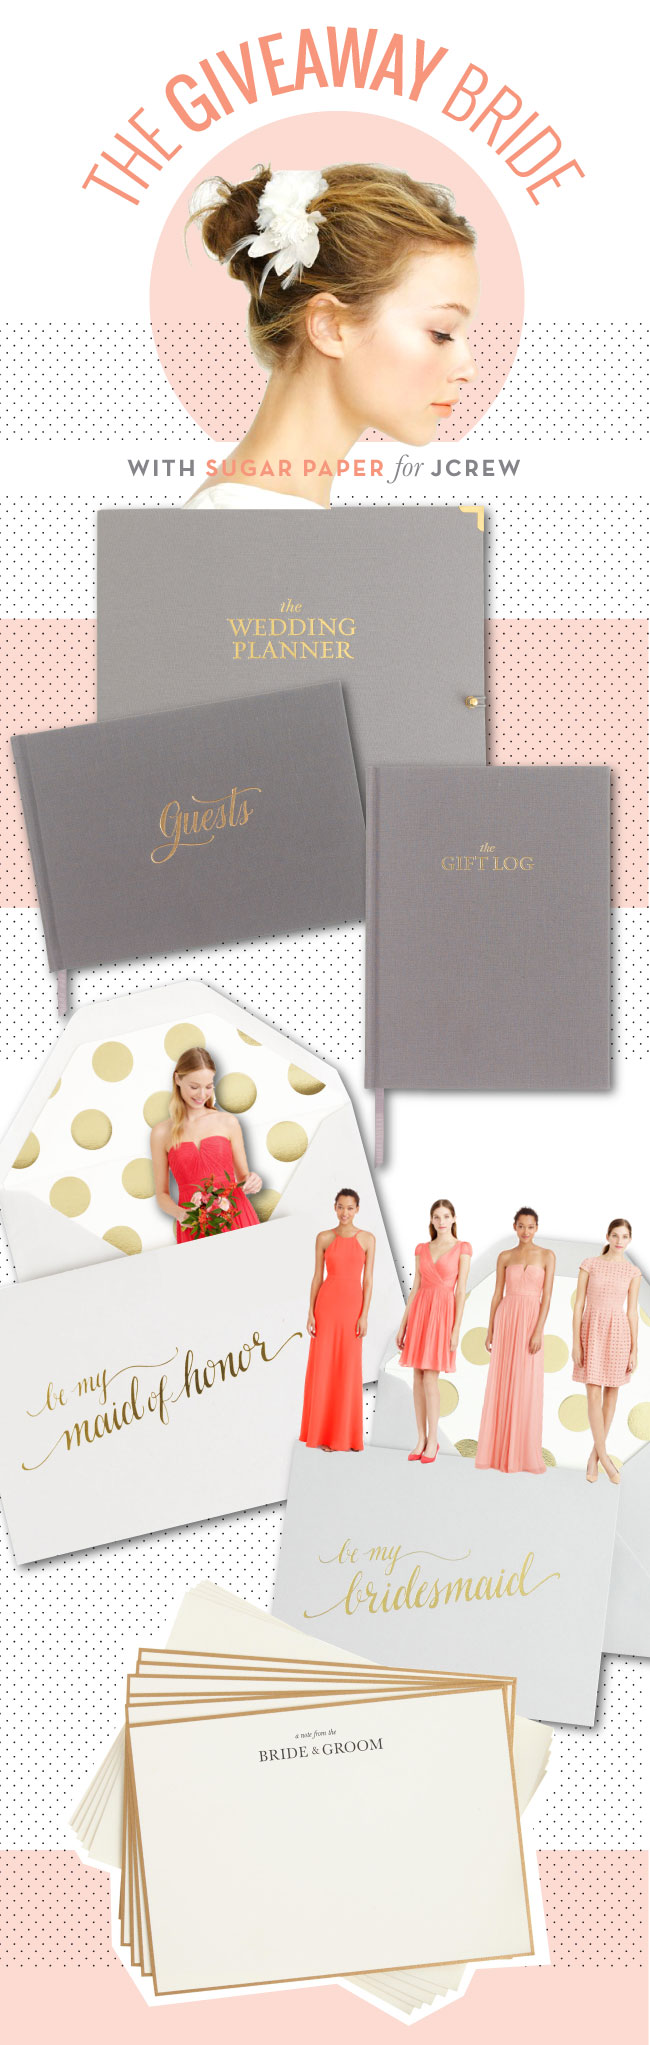 The-Giveaway-Bride.jpg